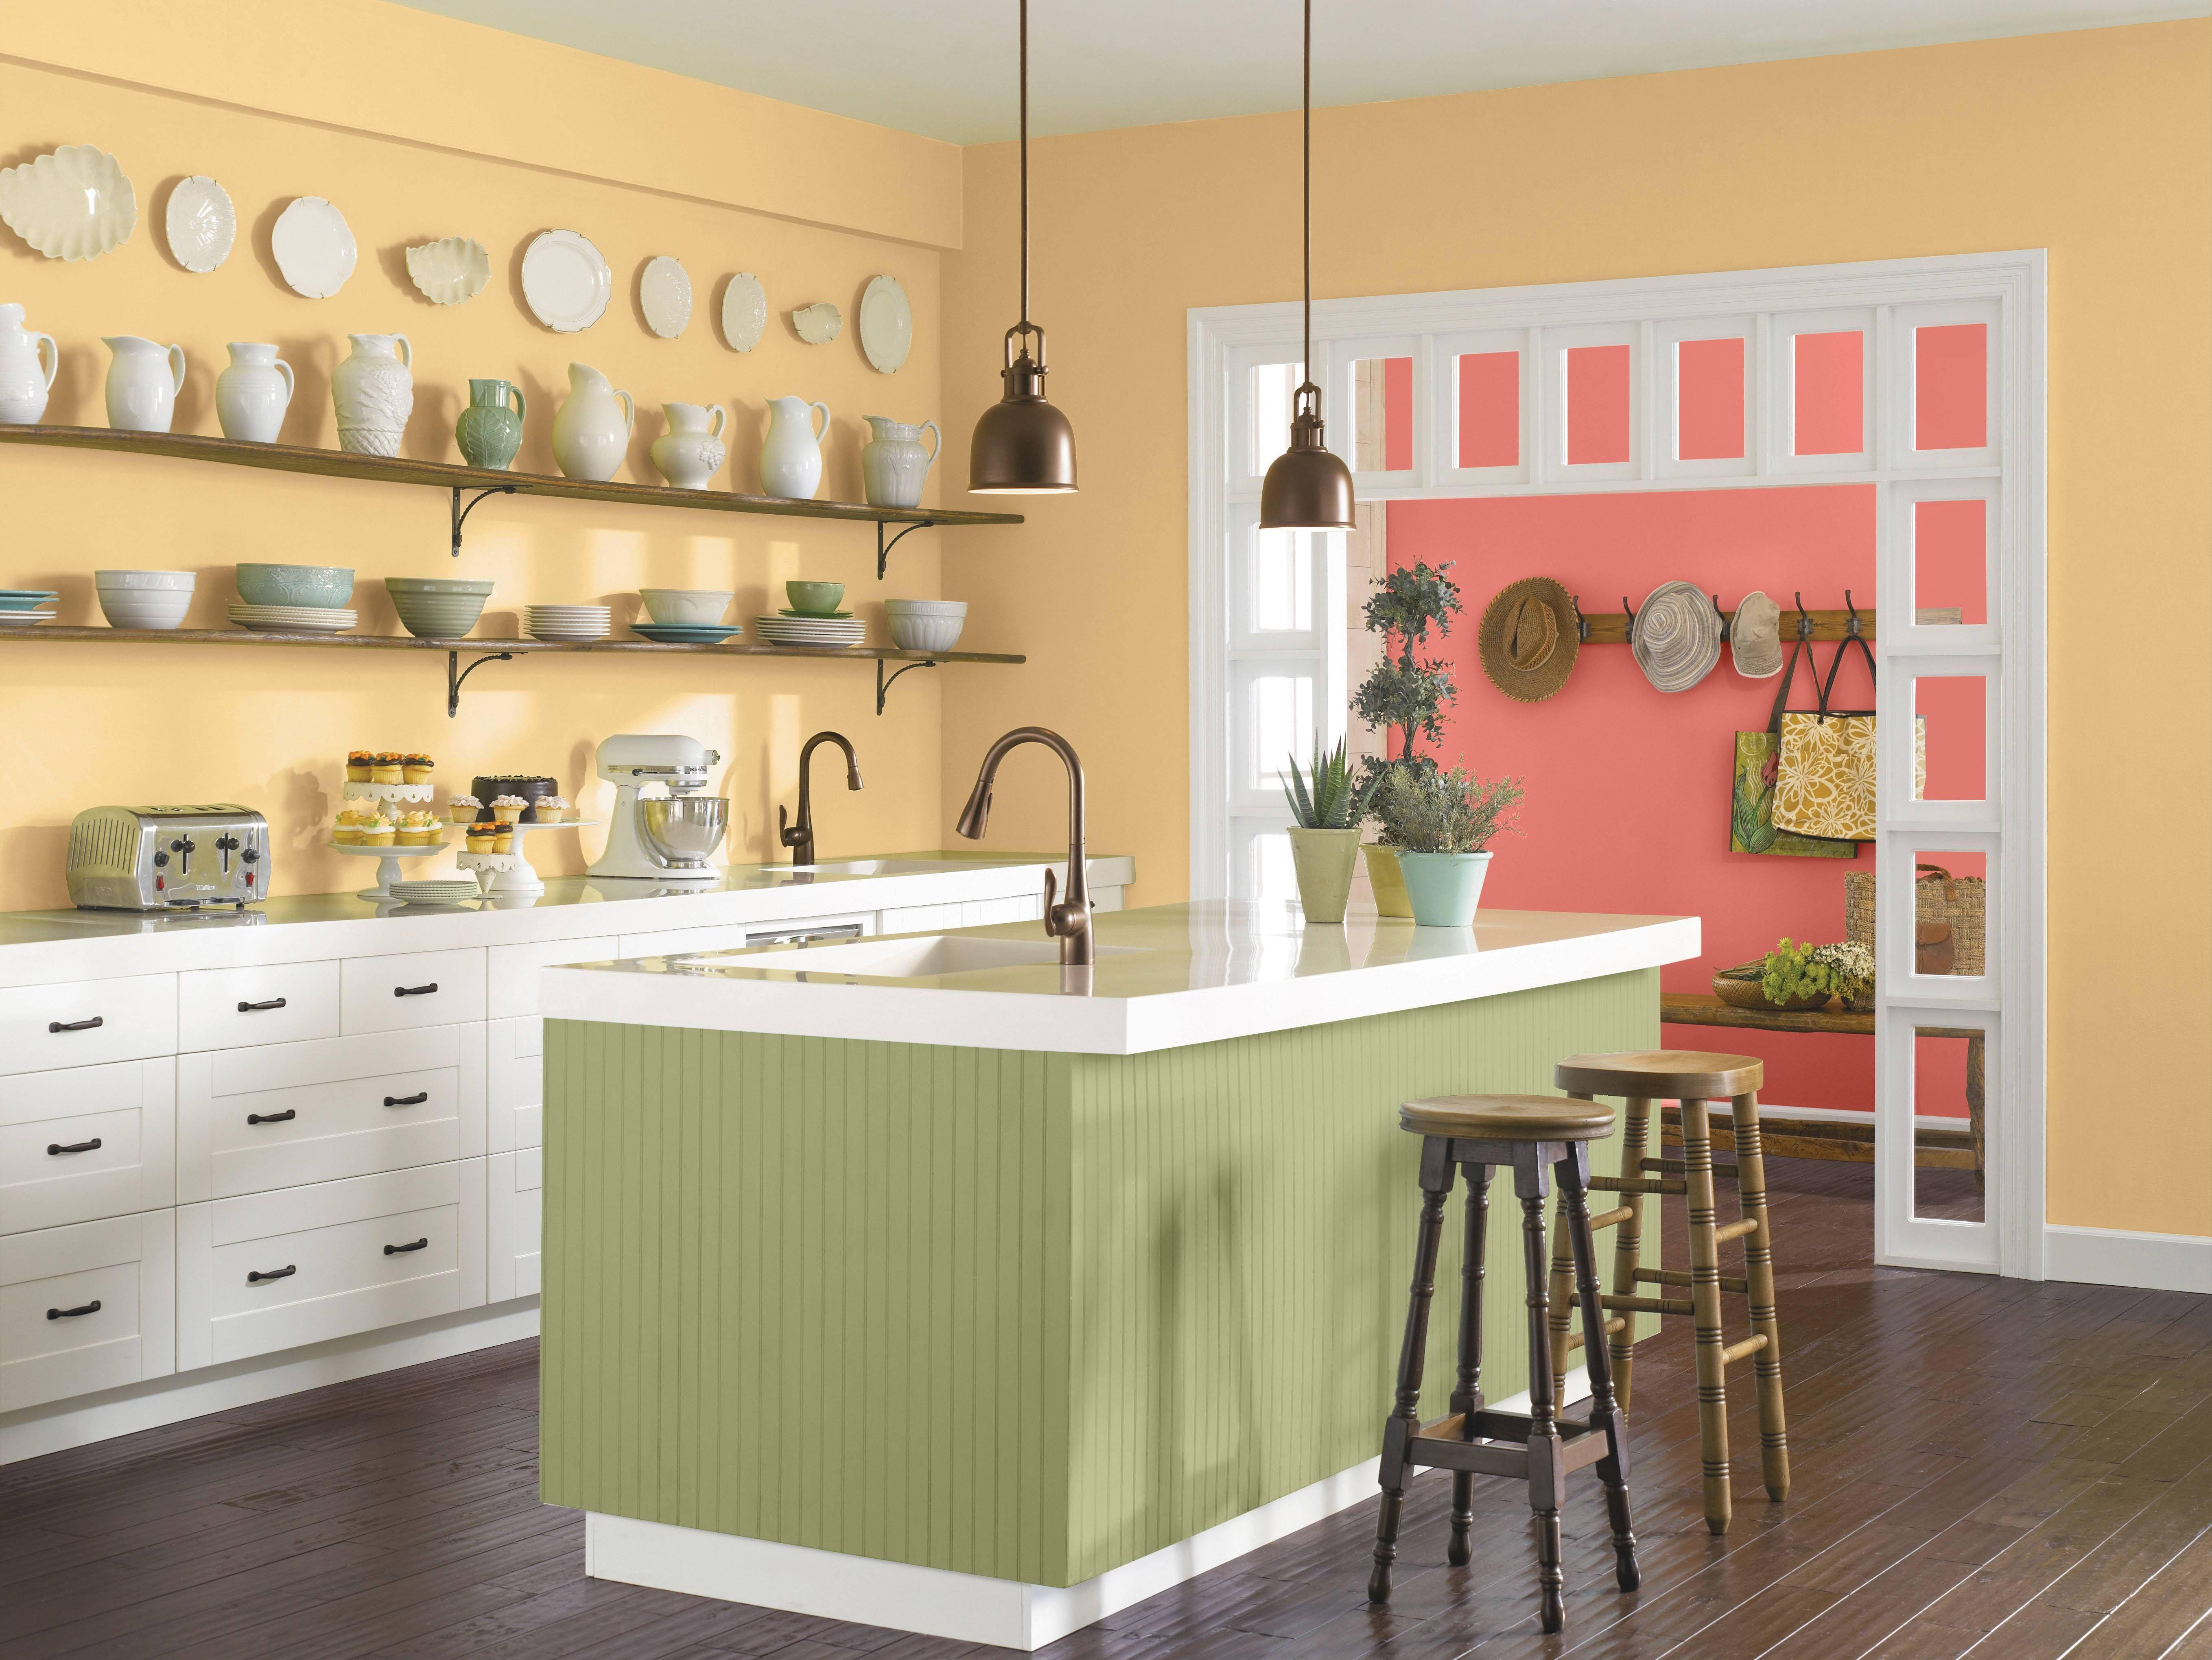 100 Cabinet Designs Ideas For Modern Kenyan Kitchens Kitchen Cabinets Color Combination Kitchen Cabinet Color Schemes Modern Kitchen Paint